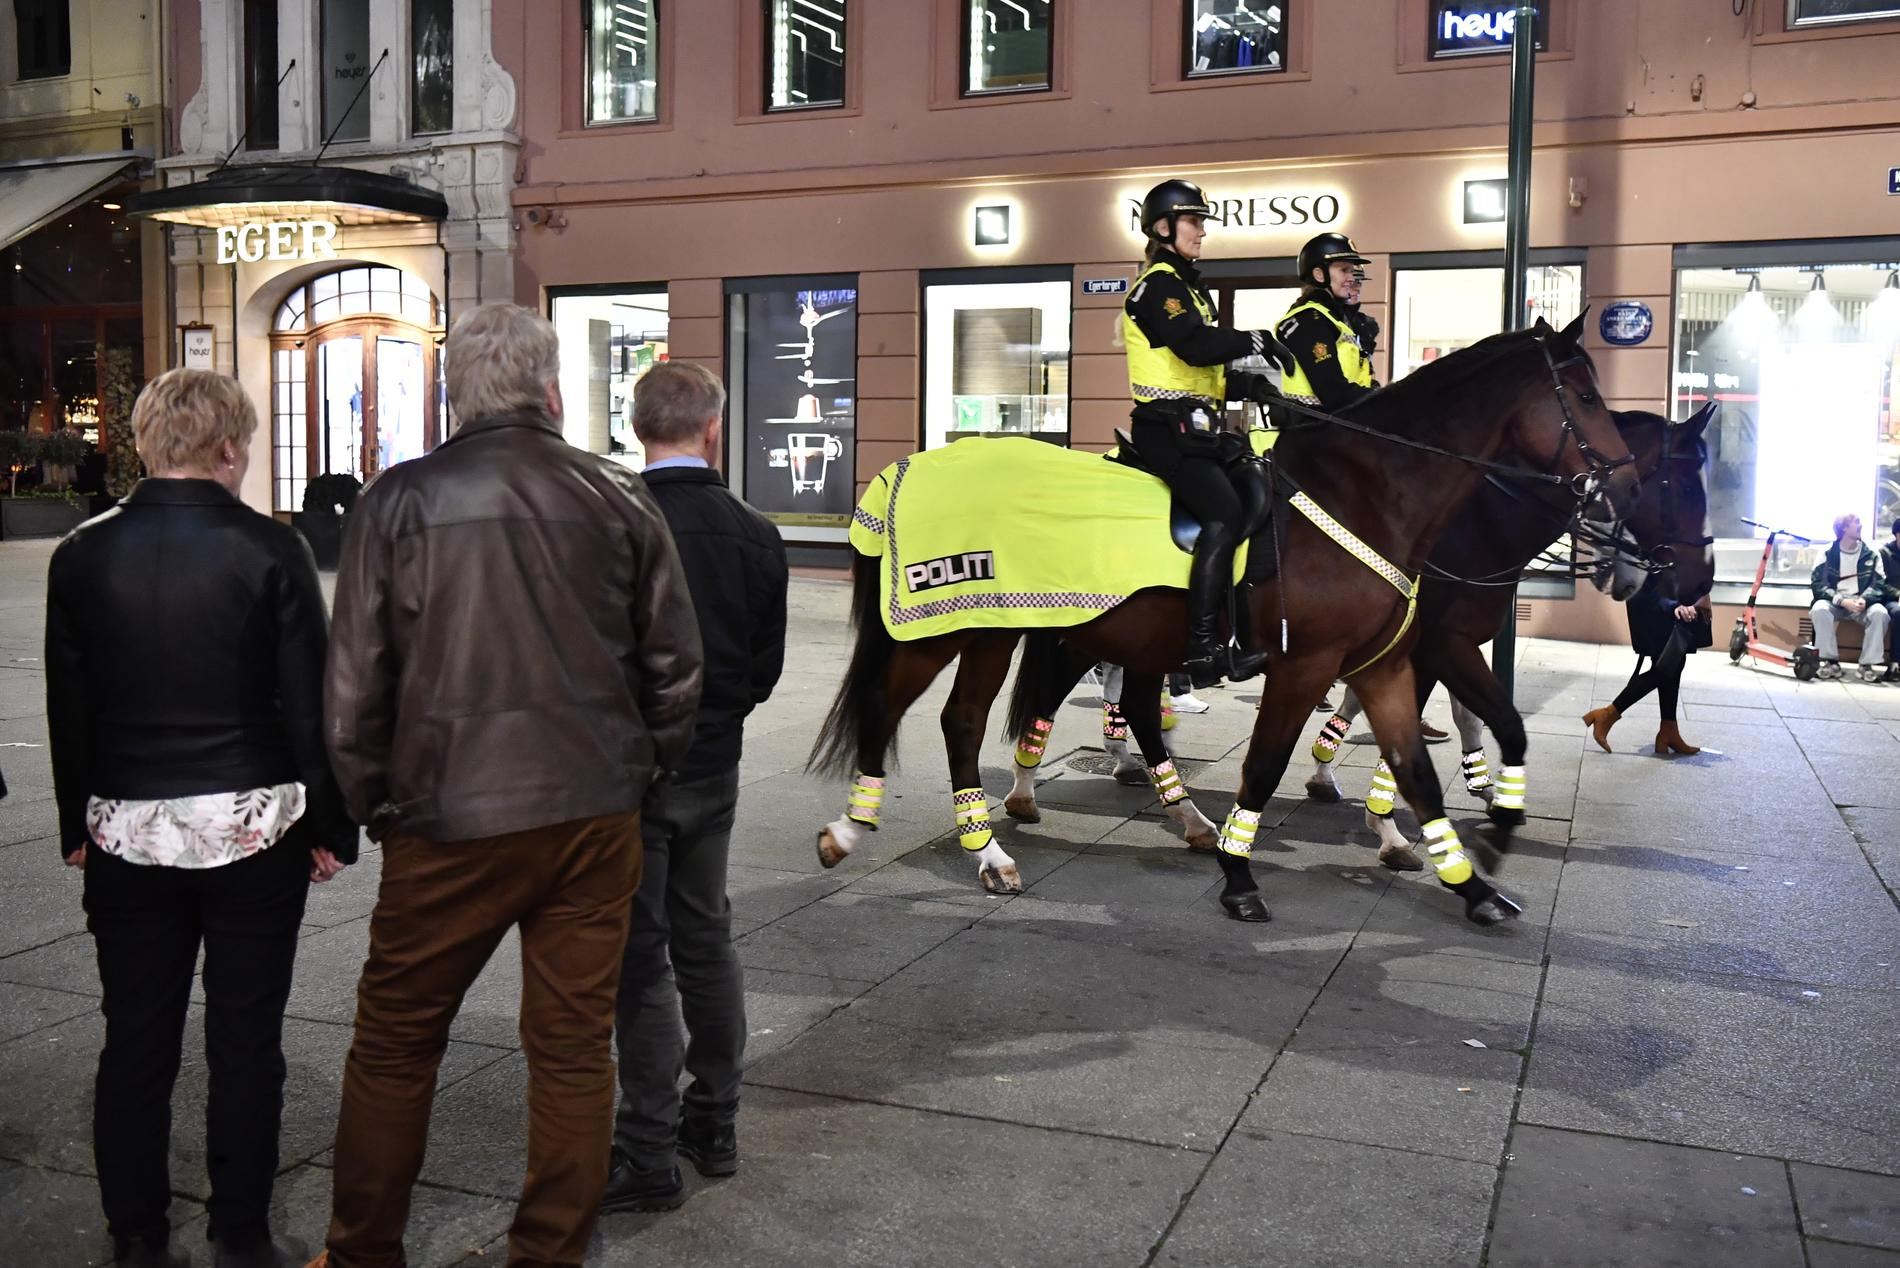 Oslopolisen hade omkring 200 ärenden.